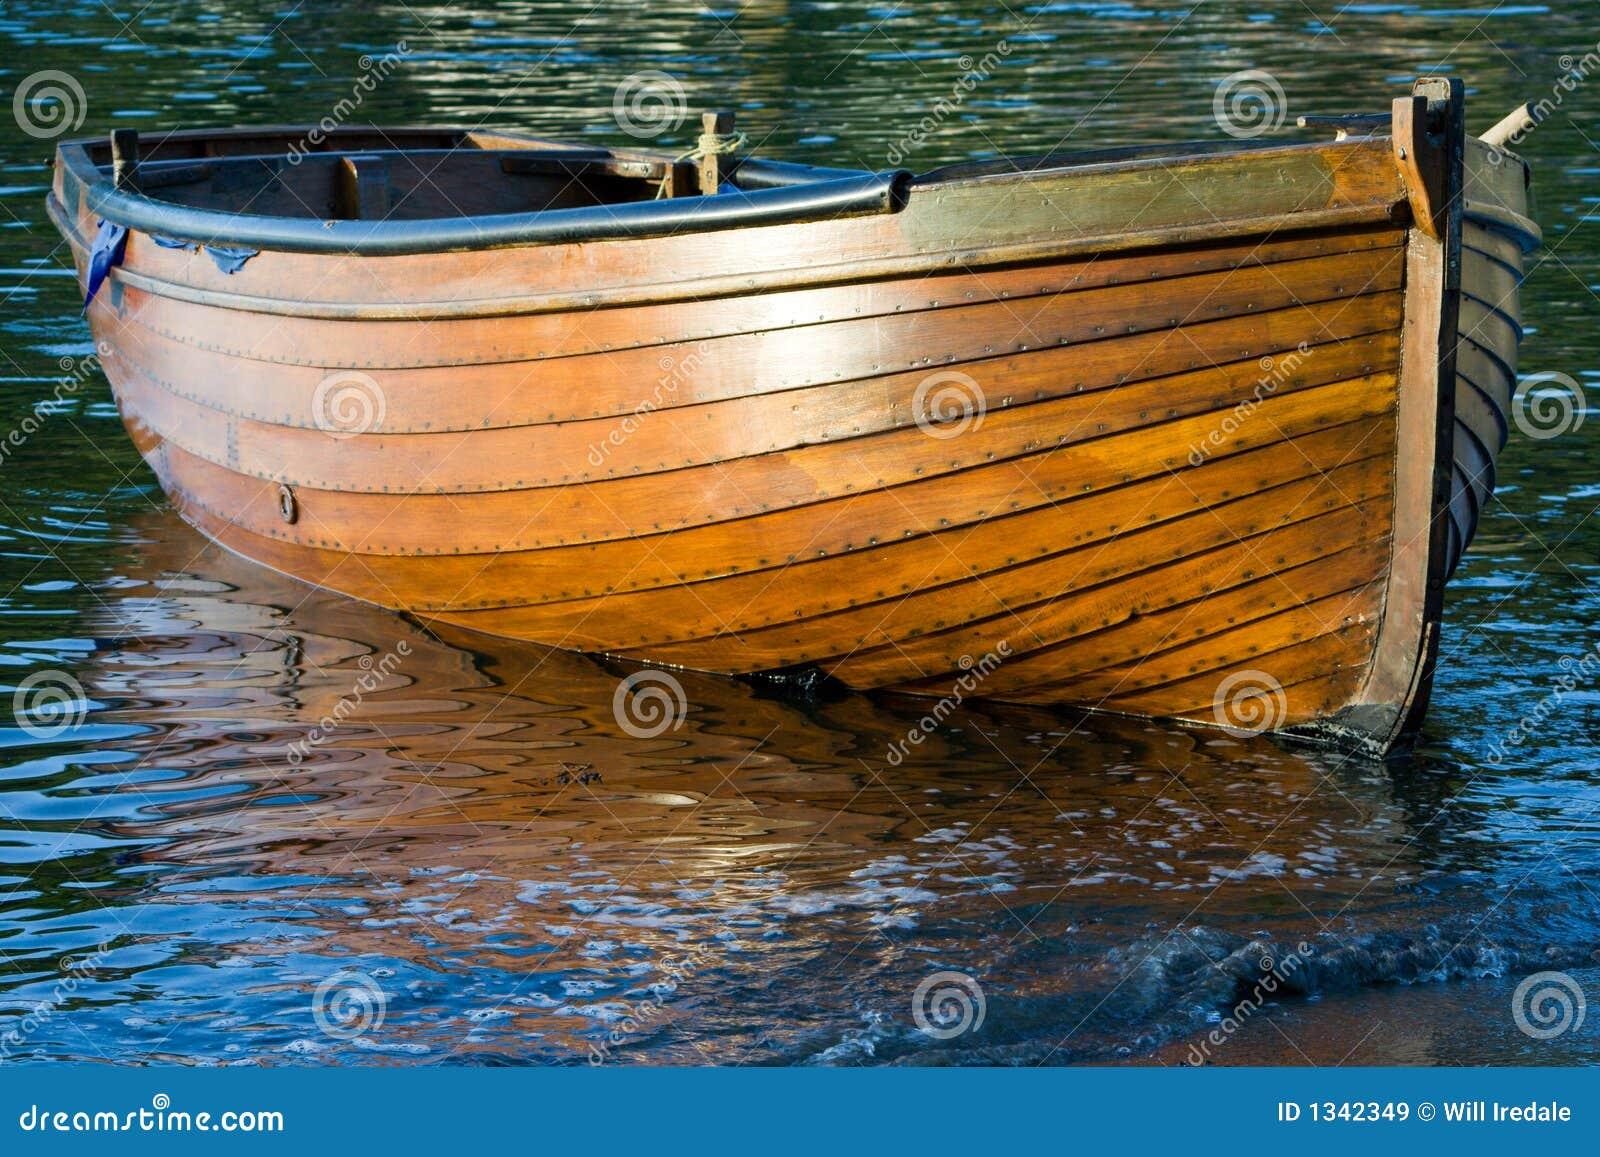 bateau d 39 aviron en bois image stock image du bateau pav 1342349. Black Bedroom Furniture Sets. Home Design Ideas